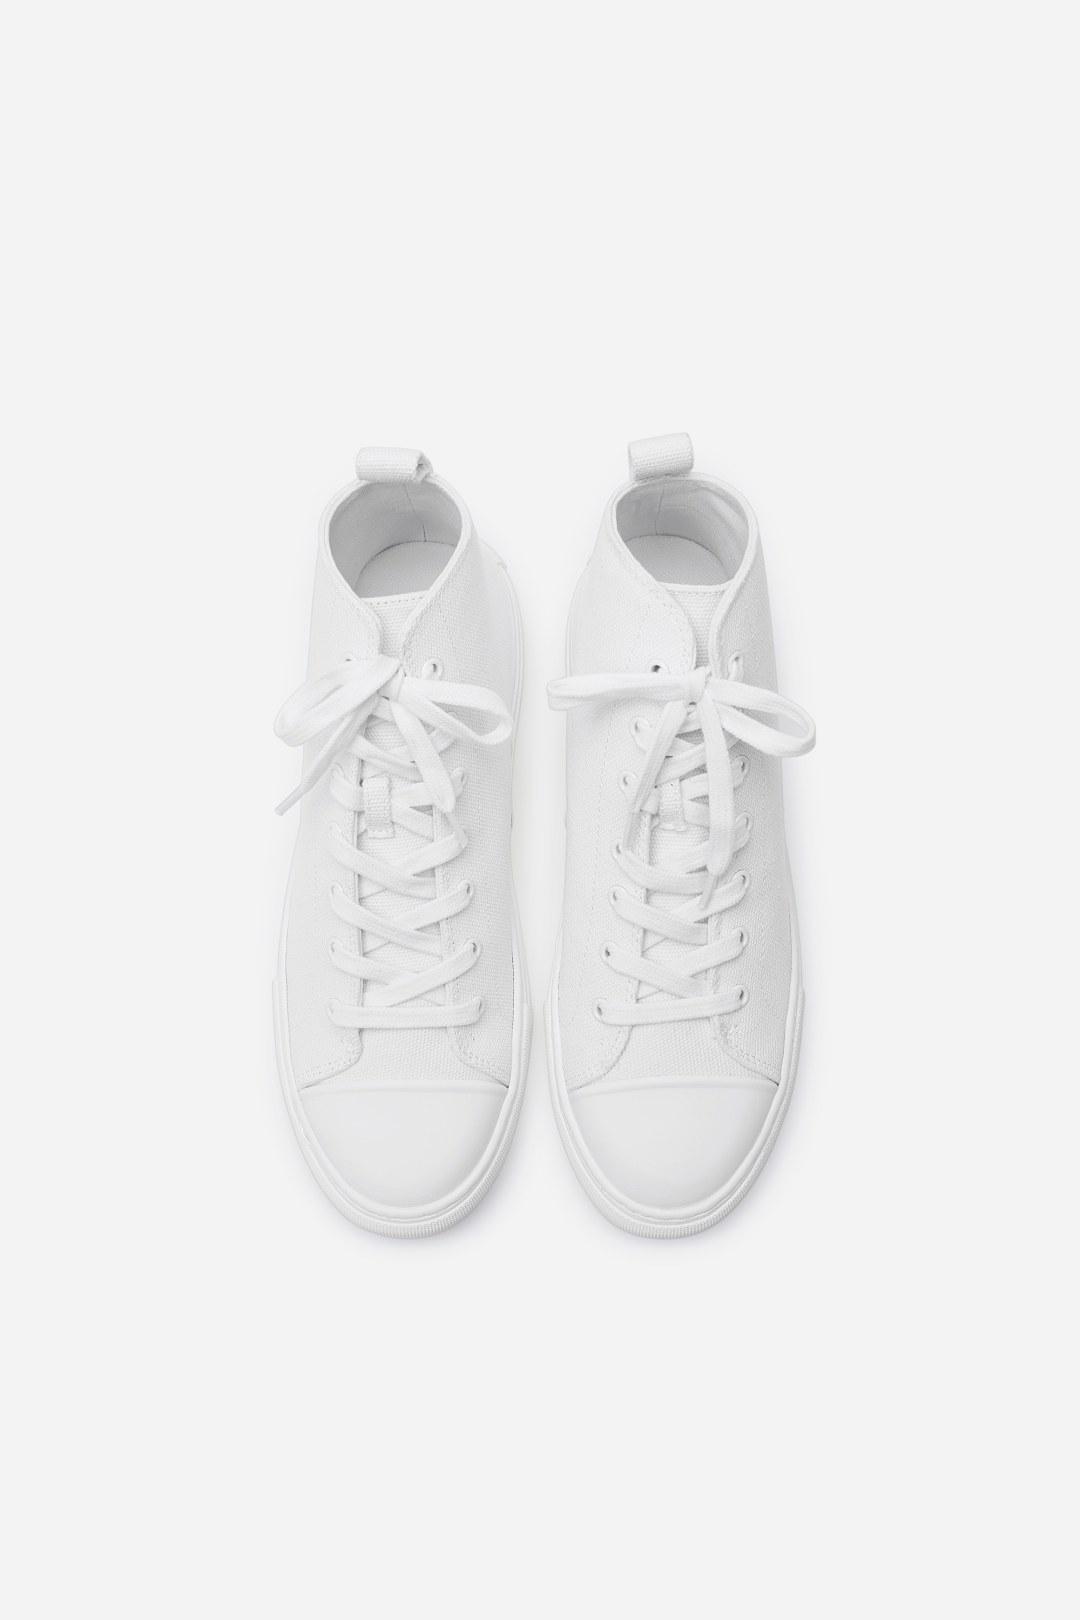 CHARLES KEITH小简约基本款帆布运动鞋小CK1-71700035-小ck中文网